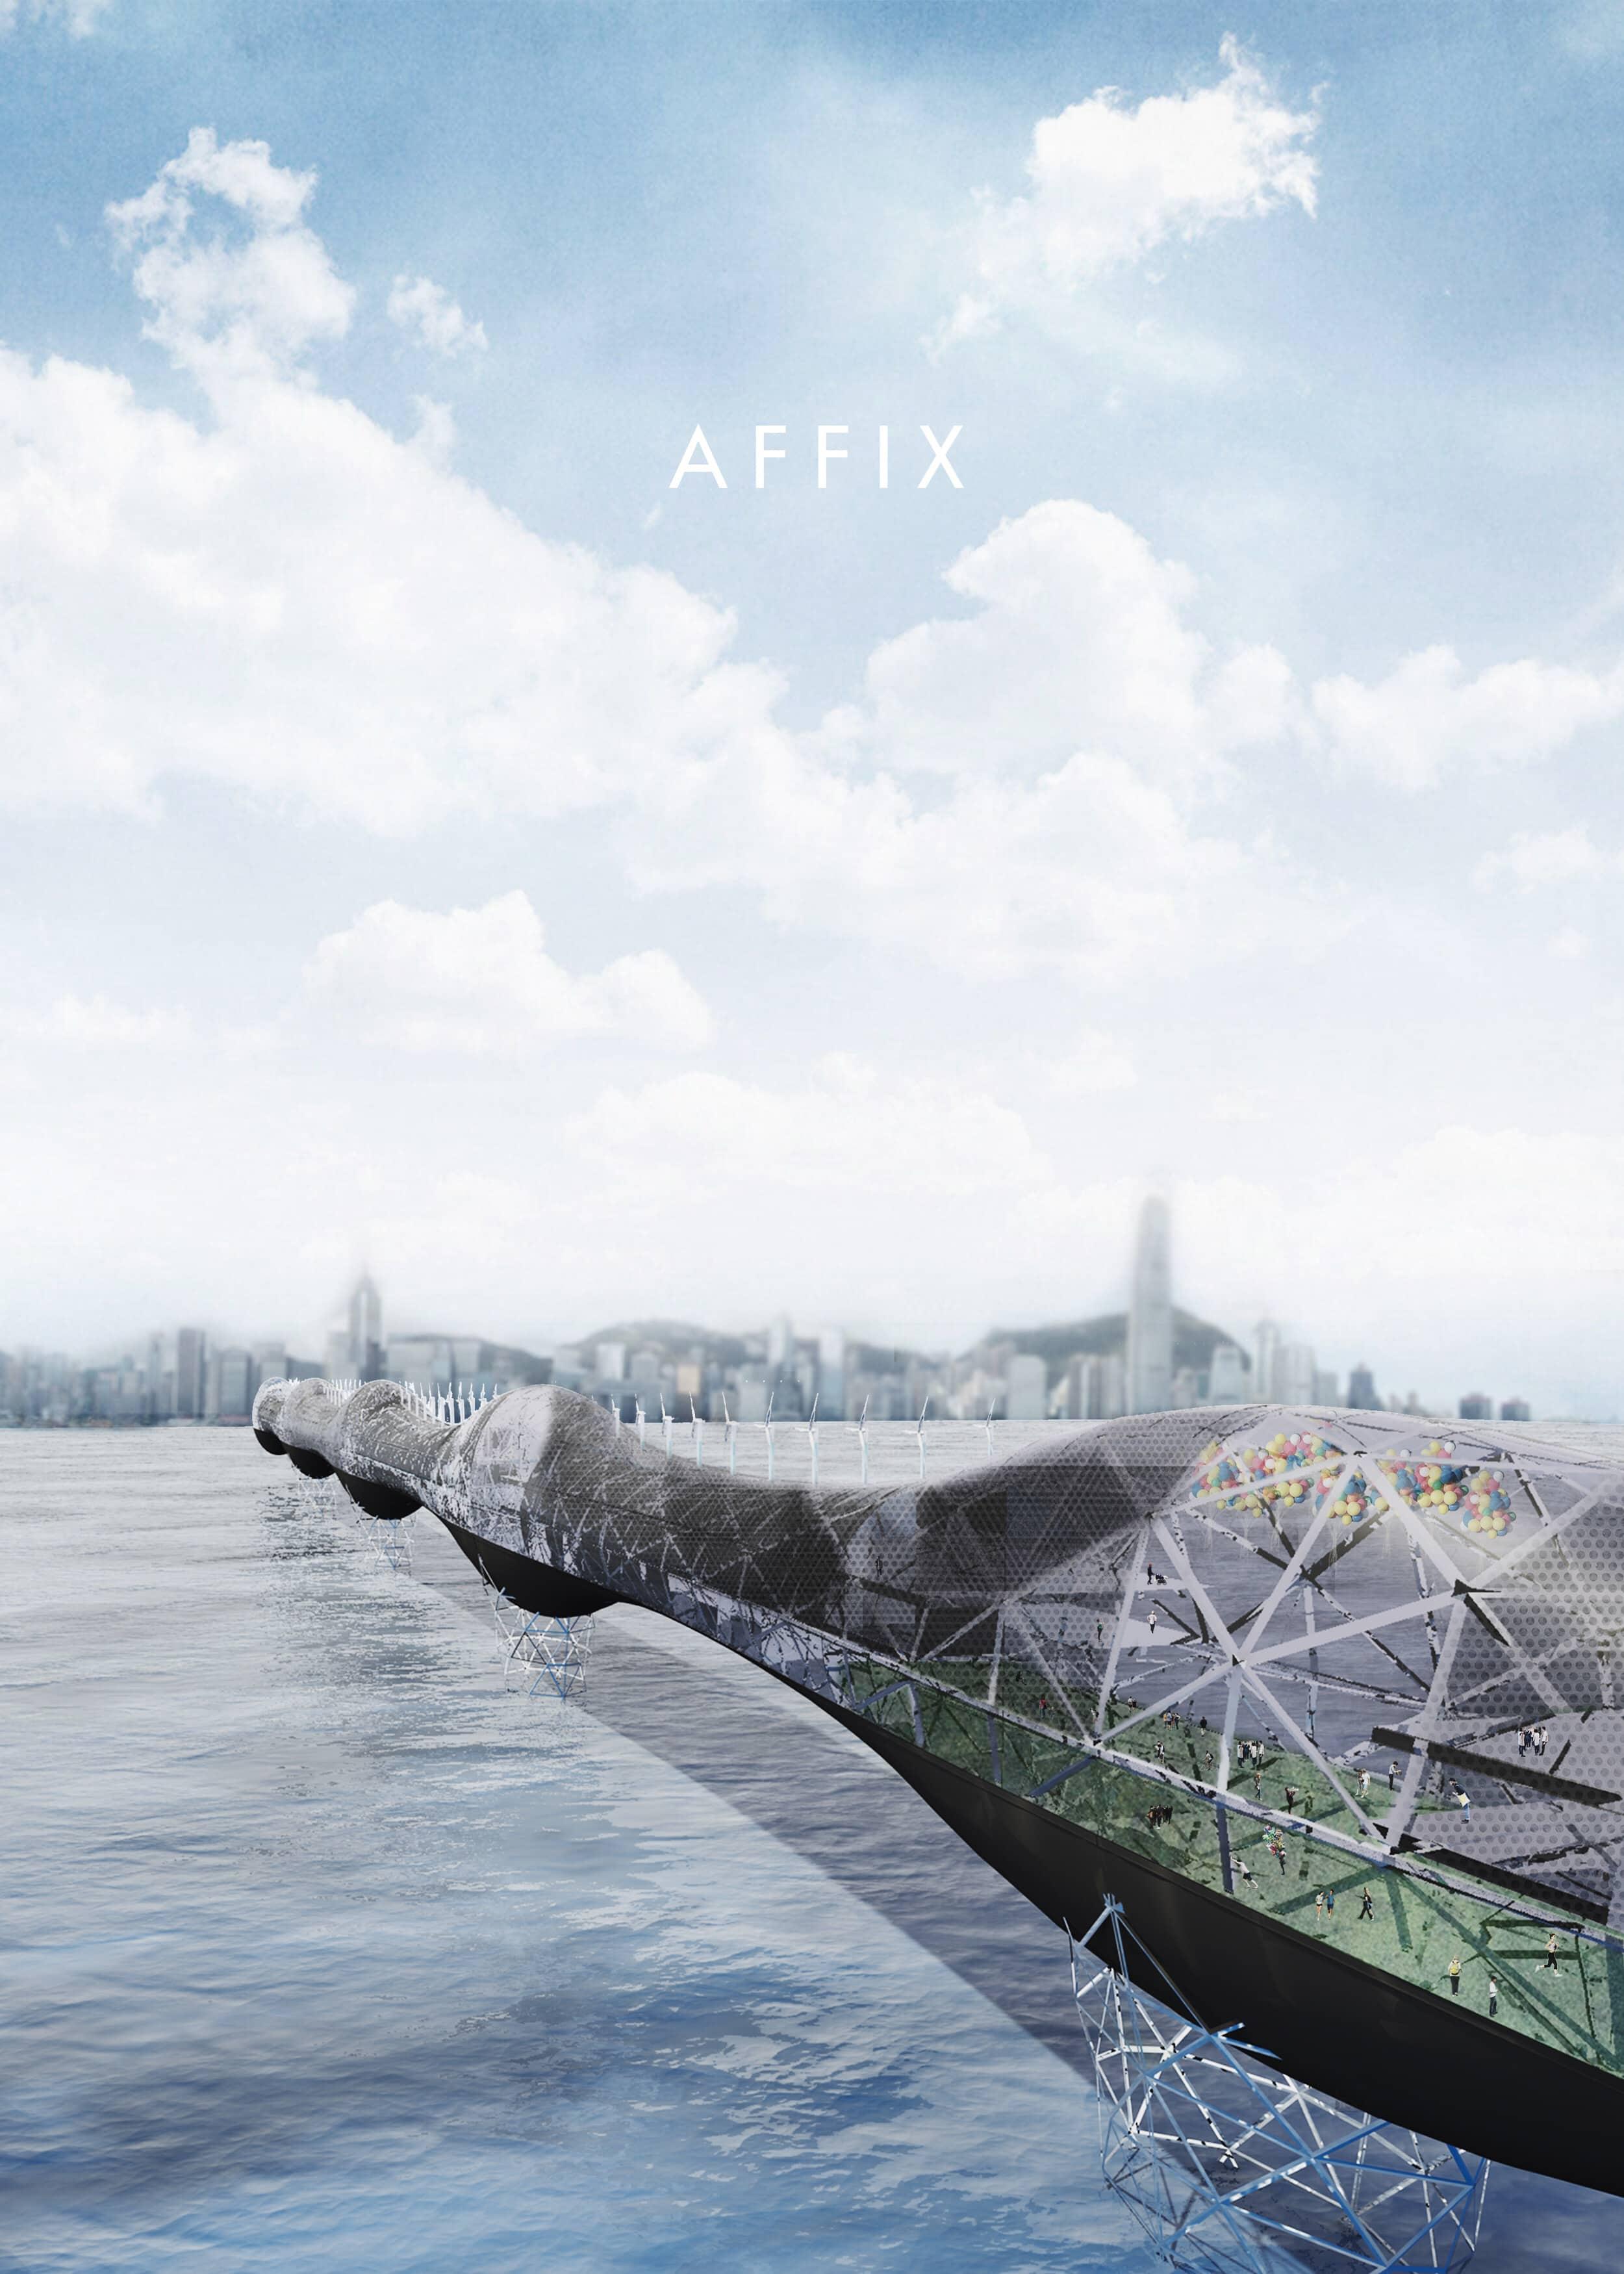 The Affix